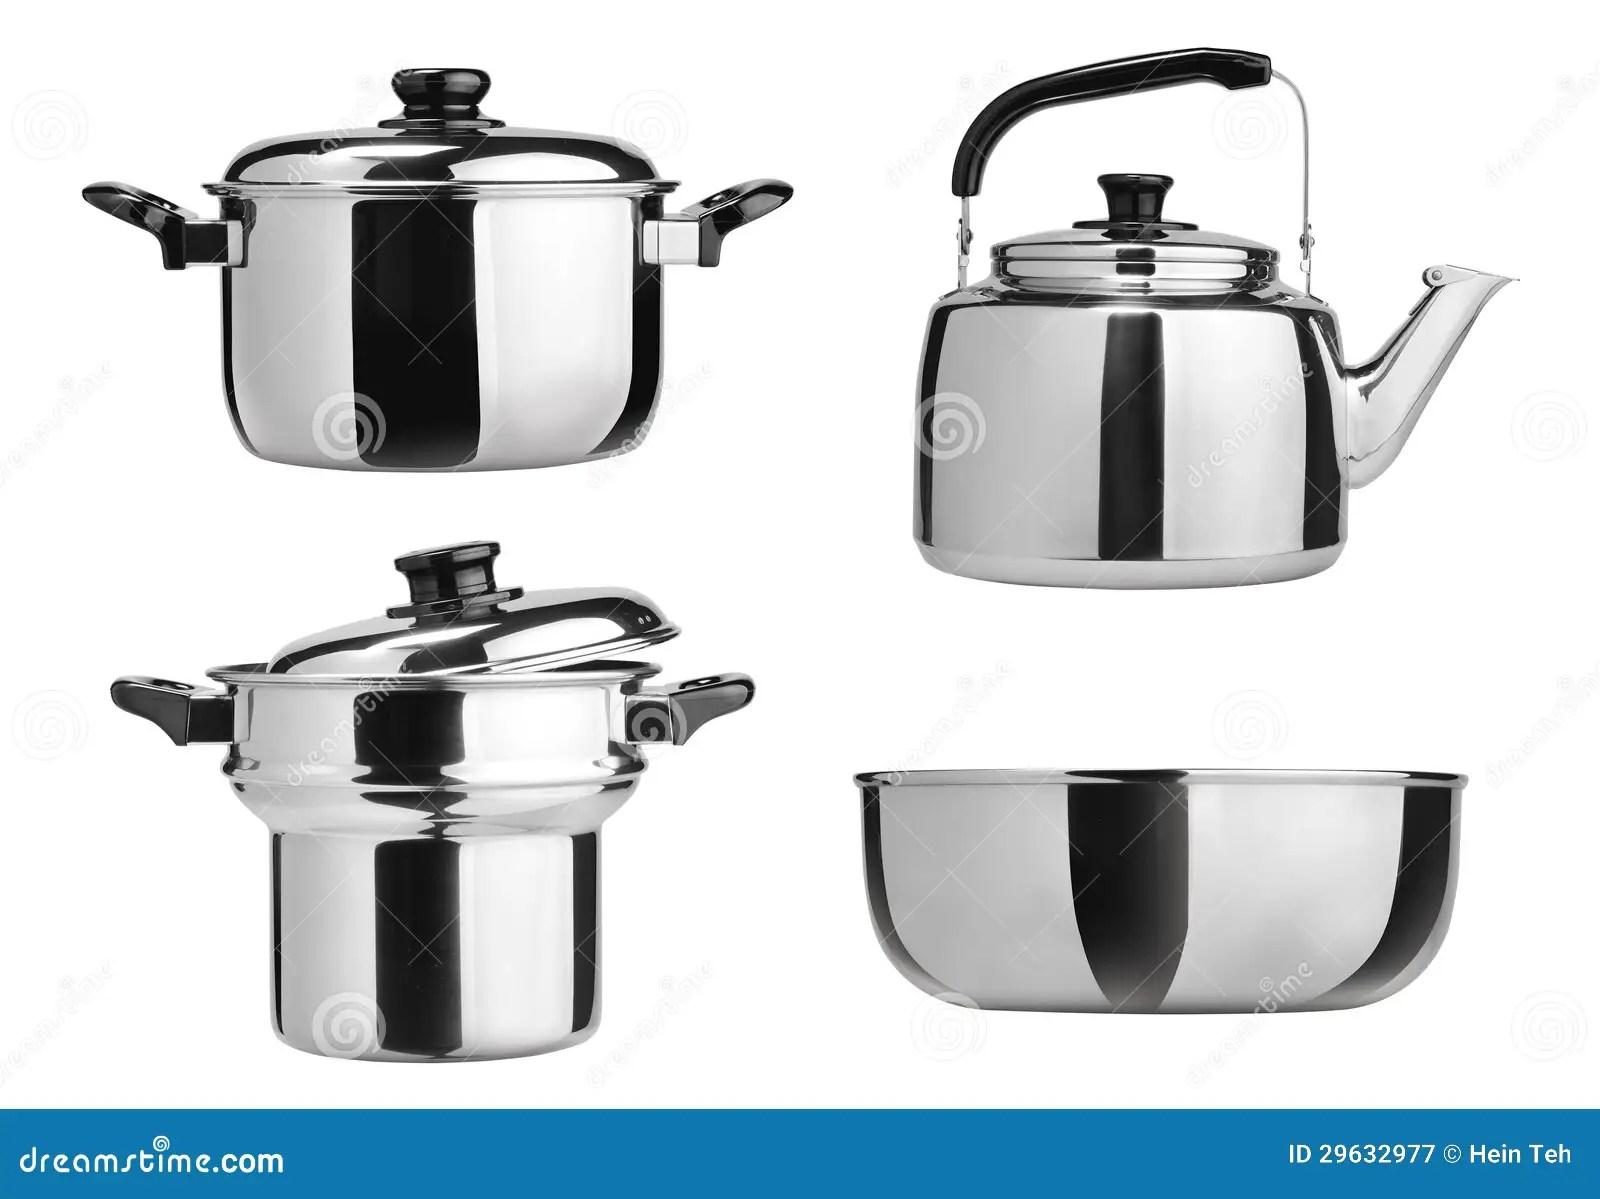 kitchen utensils wood playsets 厨具 小组不锈钢厨具库存图片 图片包括有菜单 内部 对象 平底锅 小组不锈钢厨具